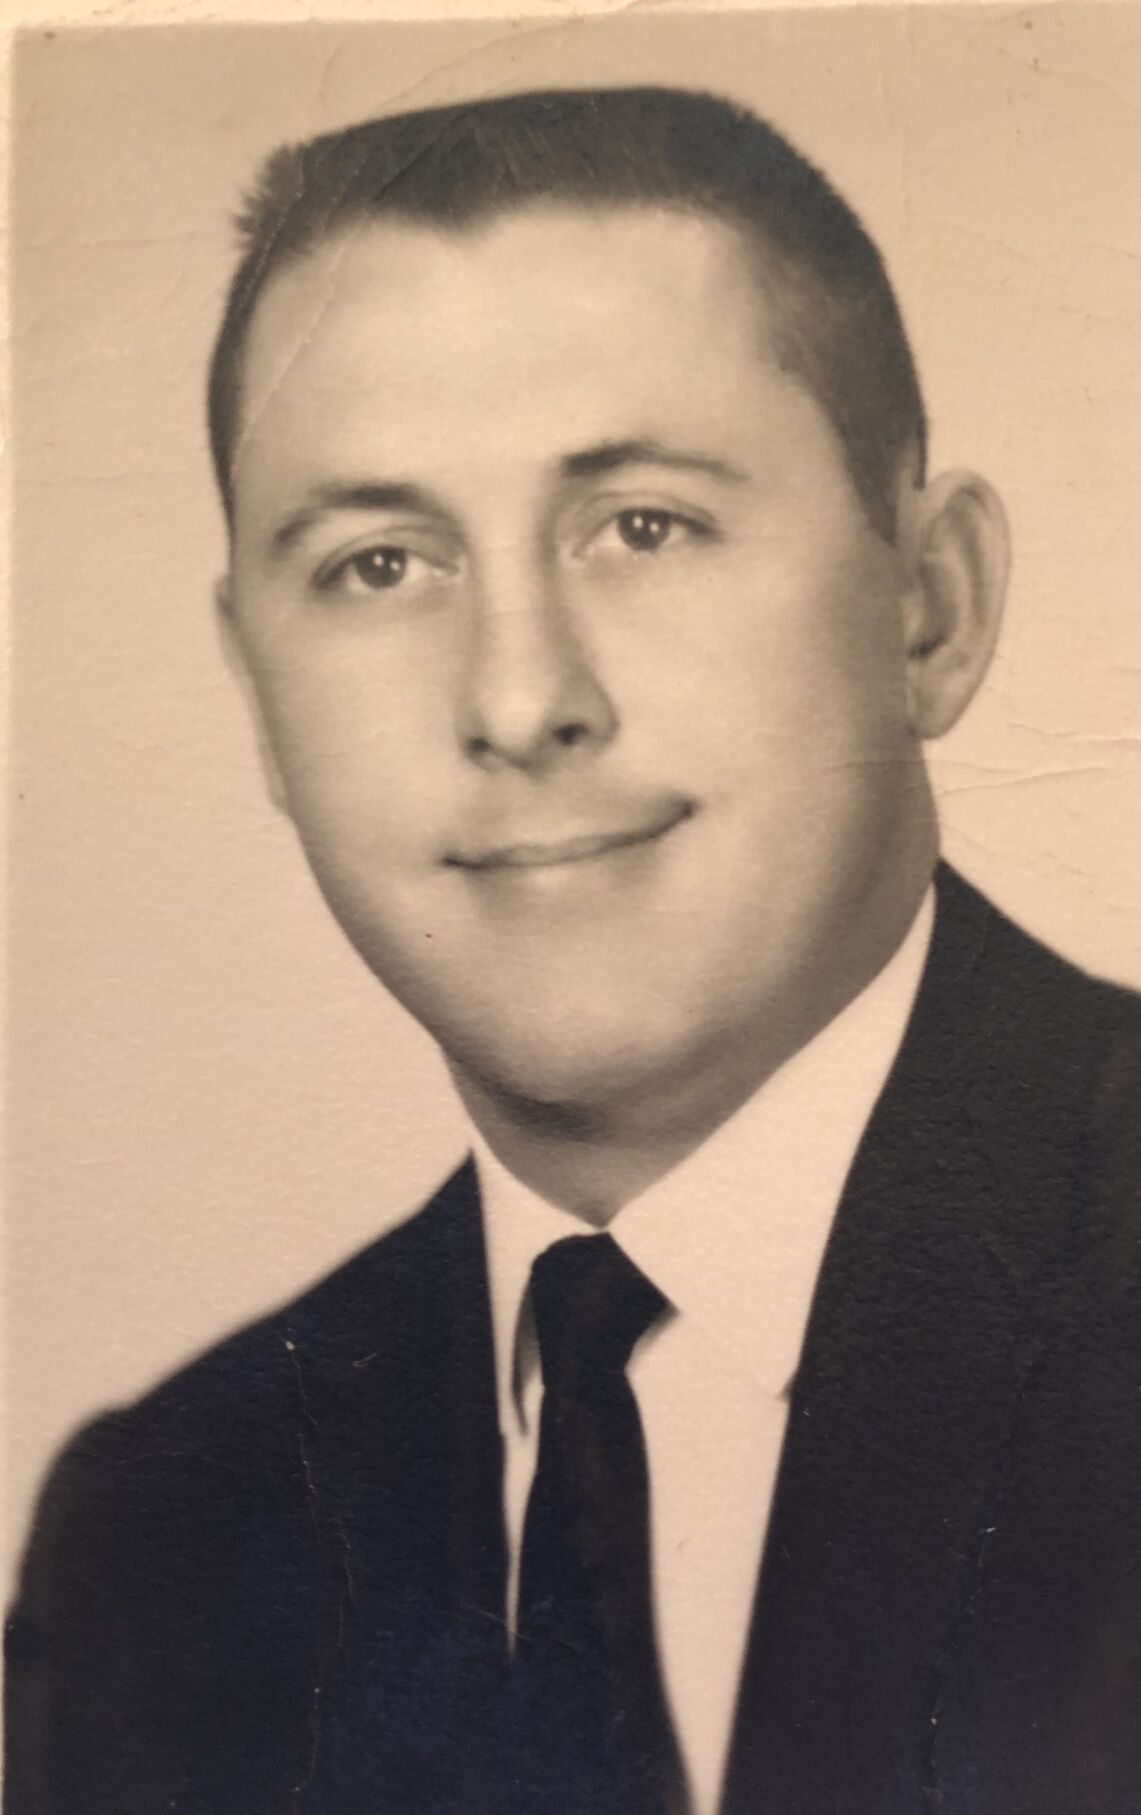 Robert McLeroy